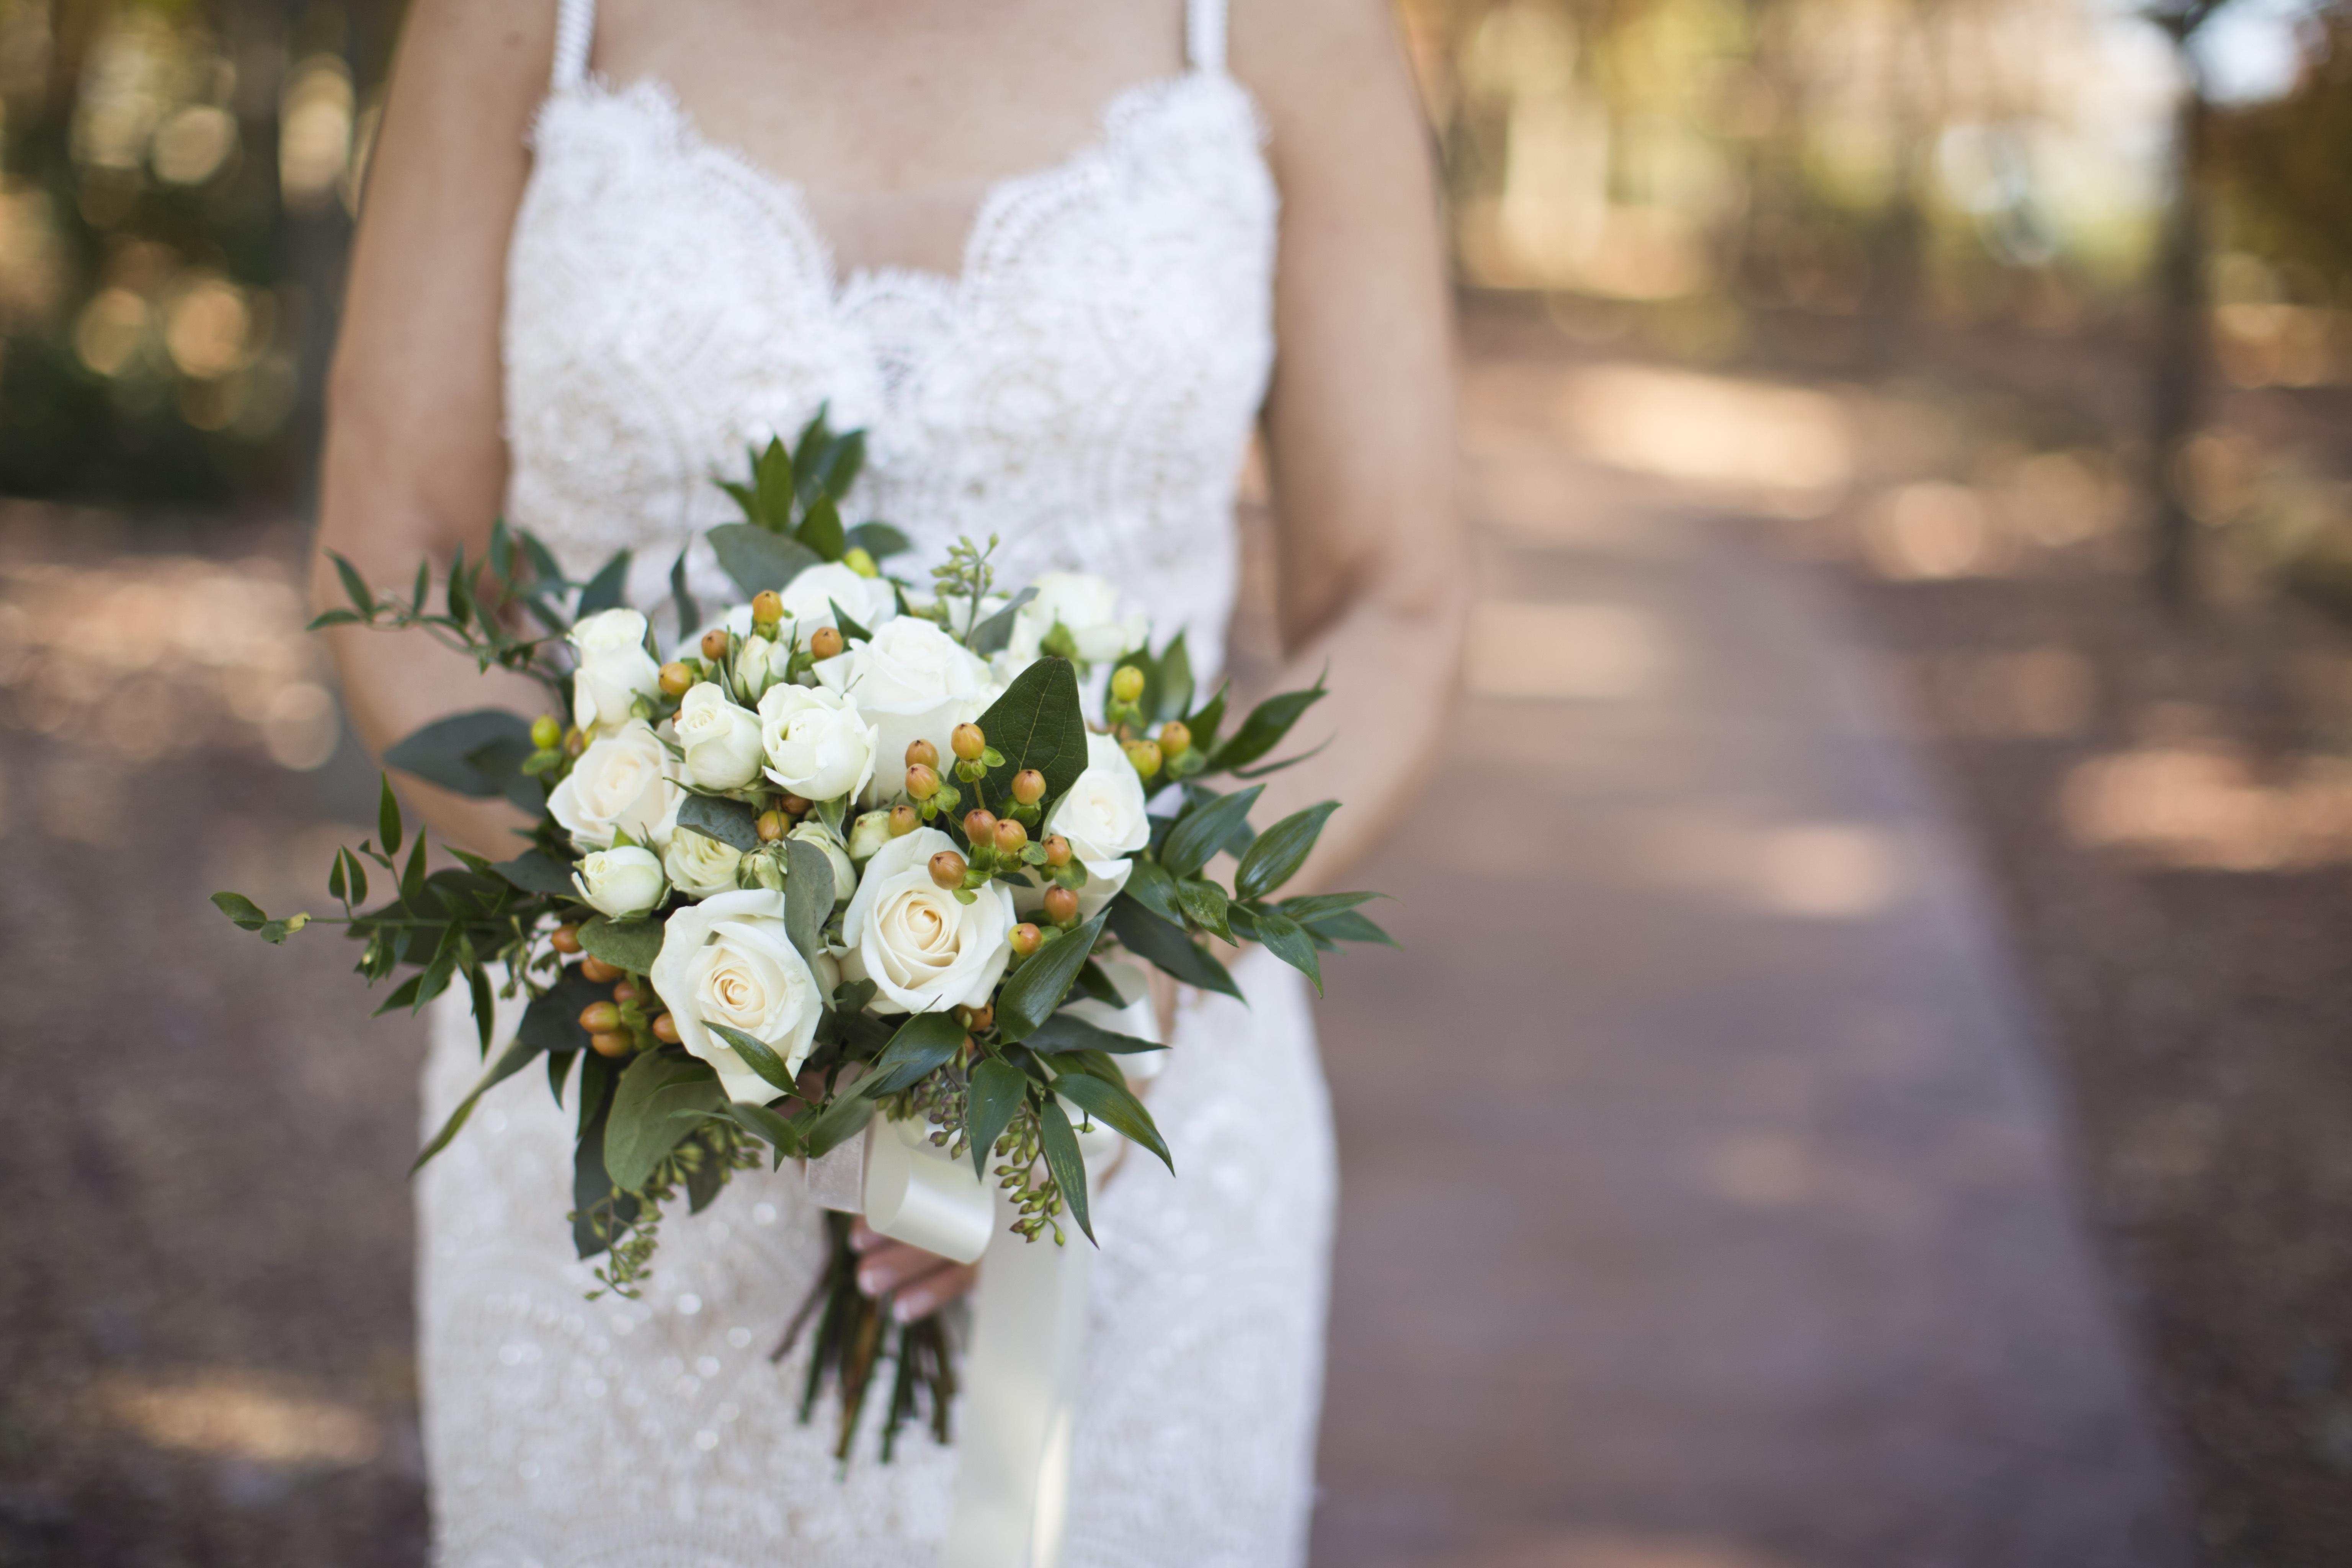 Free images plant white wedding dress bride groom marriage plant white flower floral bouquet wedding wedding dress bride groom marriage flowers arrangement aisle ceremony photograph mightylinksfo